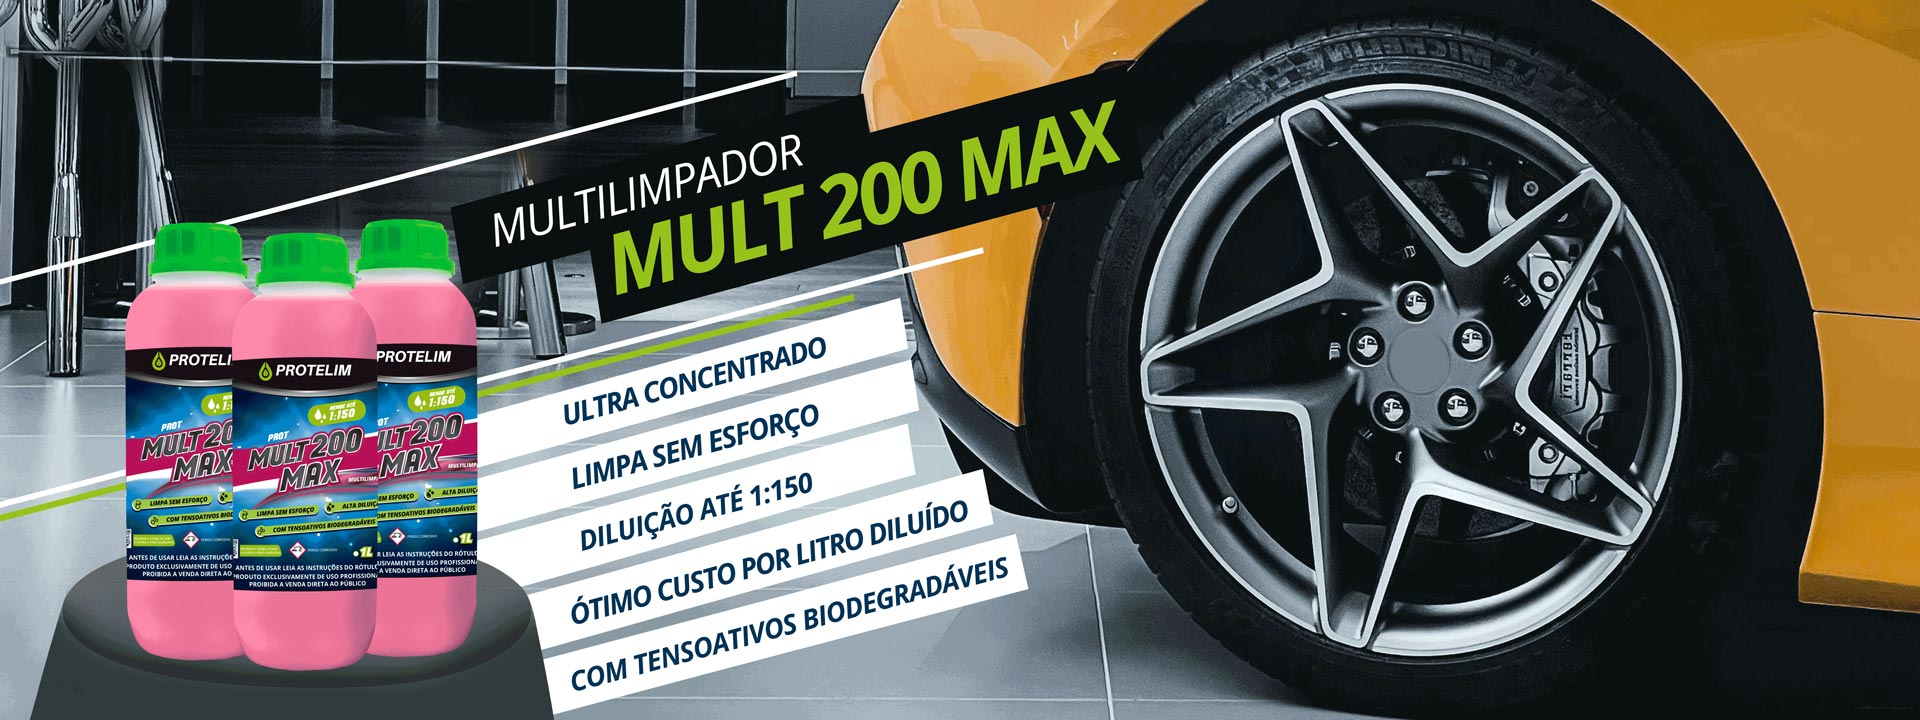 Banner-MULT-200-MAX_WEB1